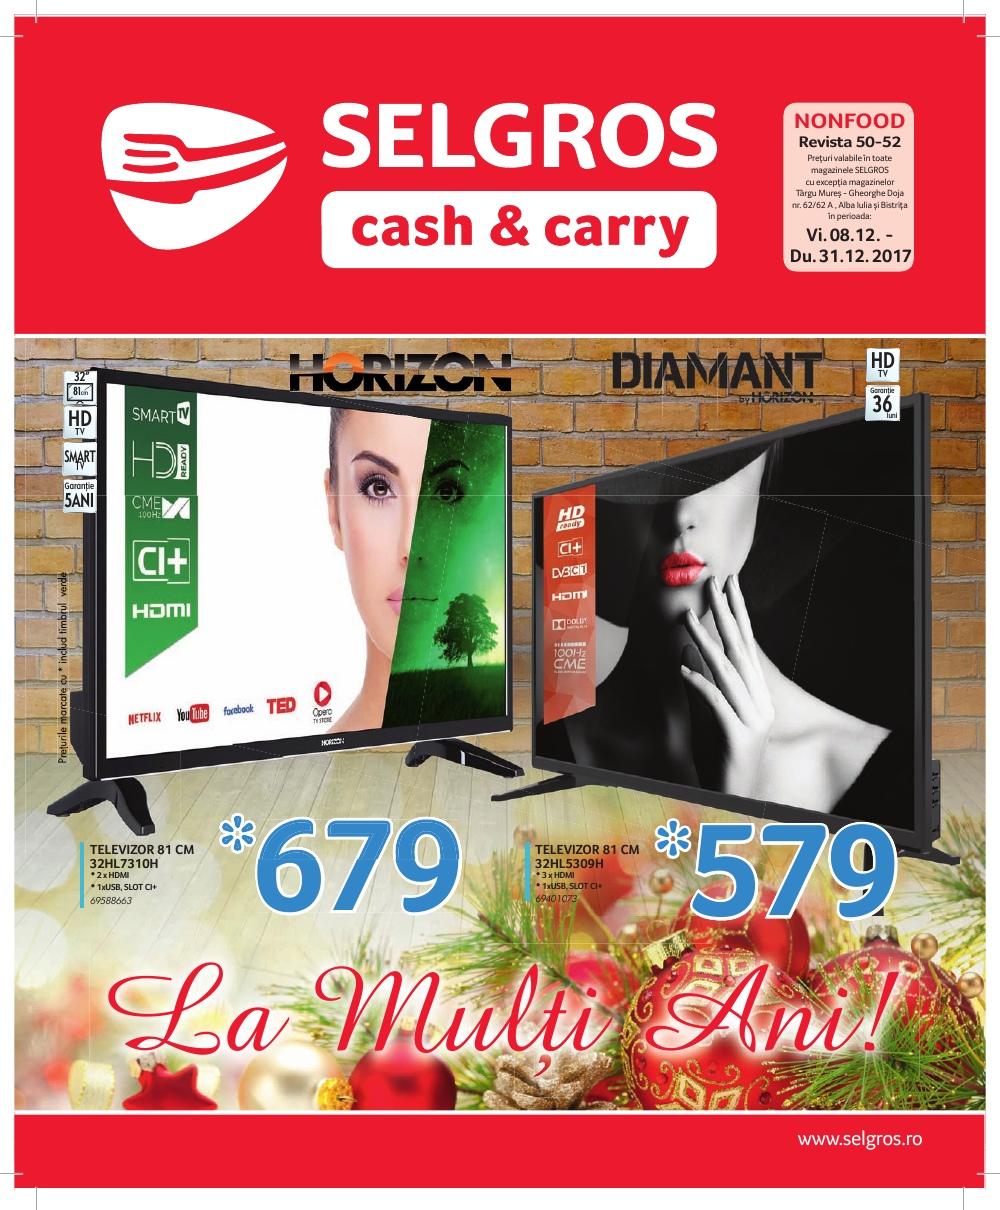 Catalog Selgros 8 decembrie - 31 decembrie 2017. Oferte nealimentare